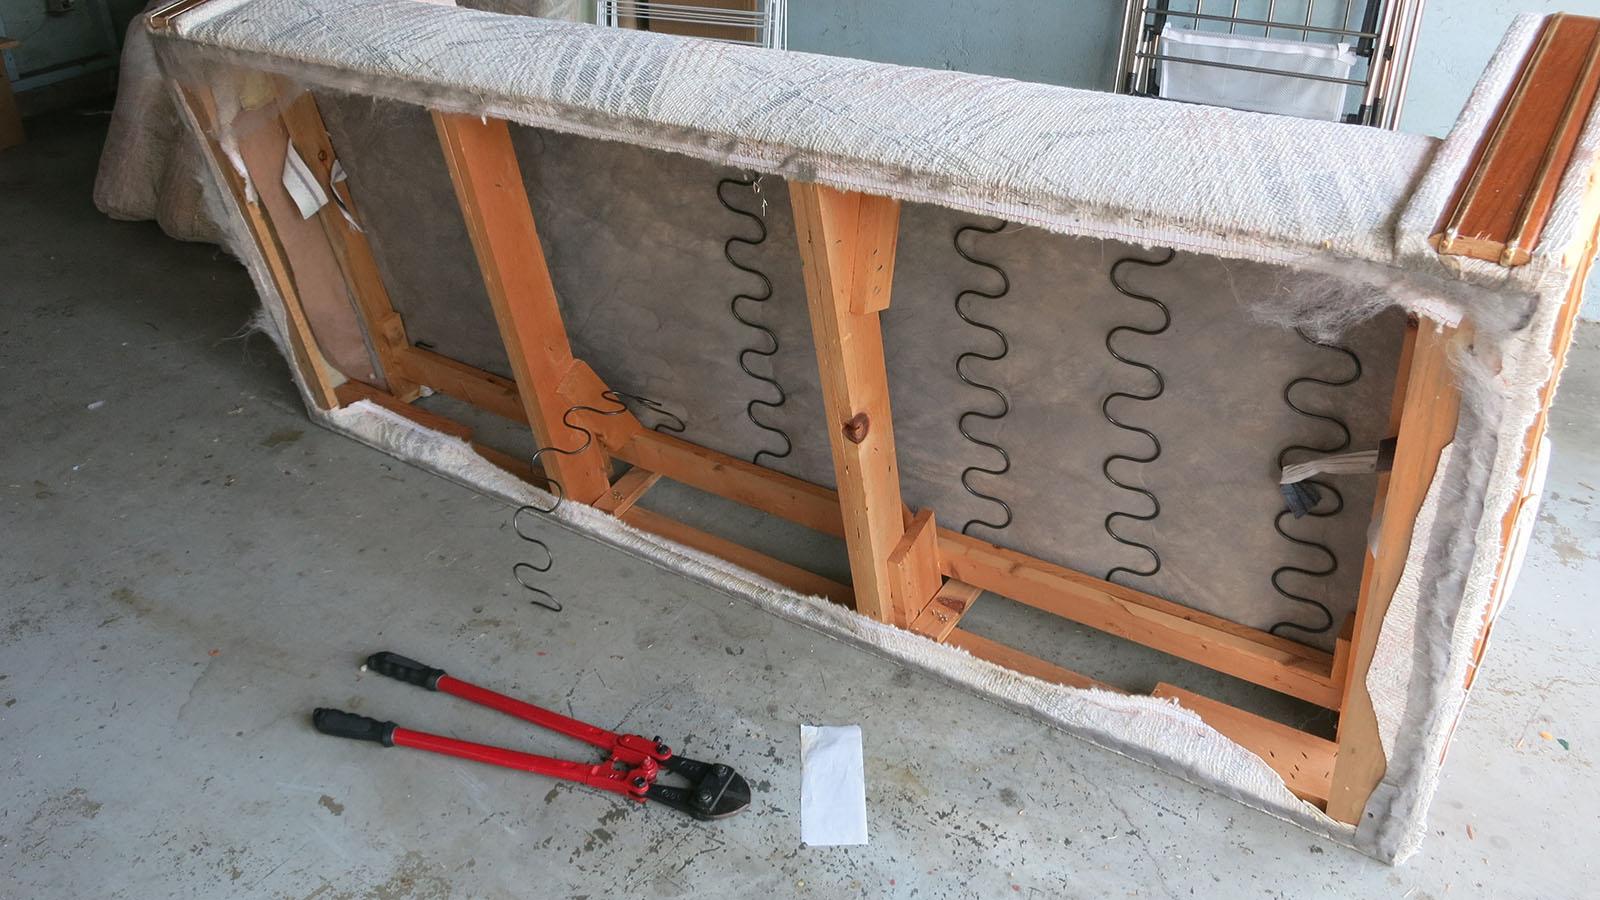 Couch Teardown 13 - cutting springs